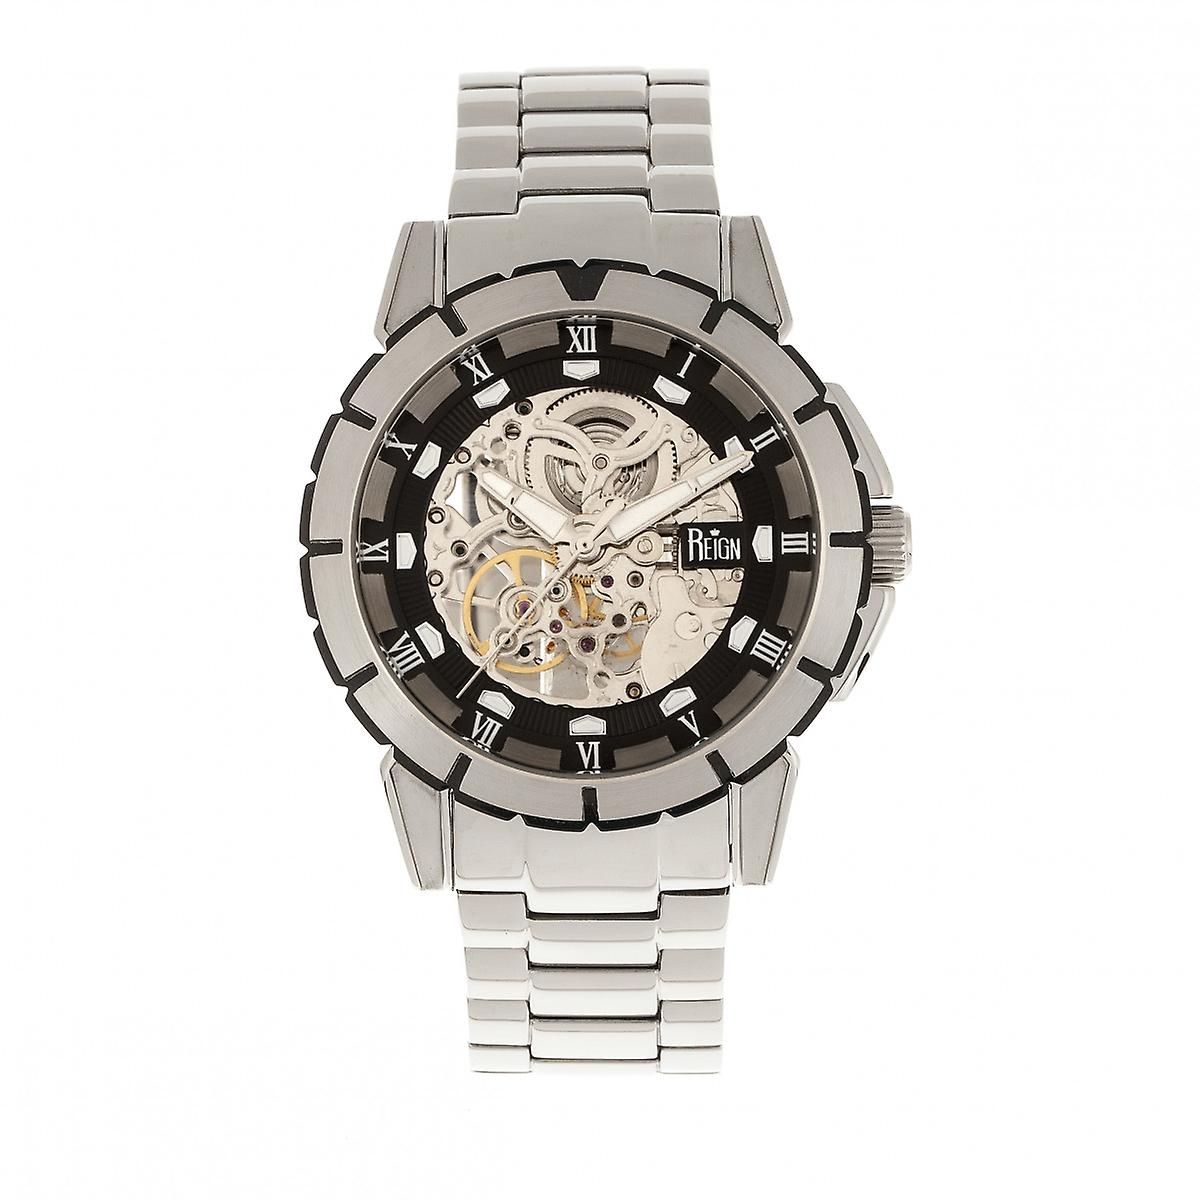 Reign Philippe Automatic Skeleton Bracelet Watch - Silver/Black